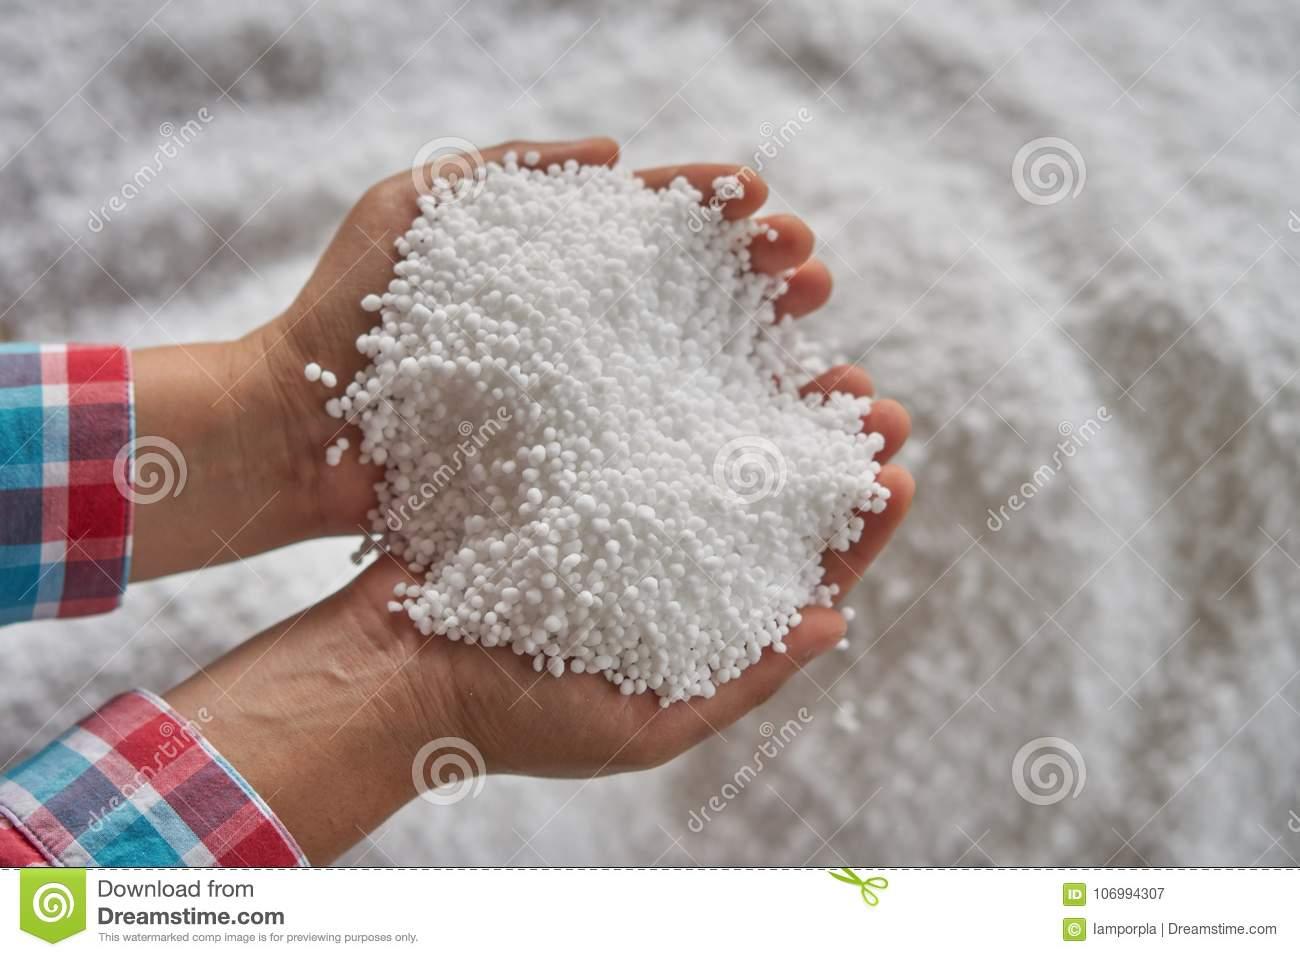 Chunky Preferential Price 4fadb research chemical RC 4F-ADB yellow powder cannabinoid